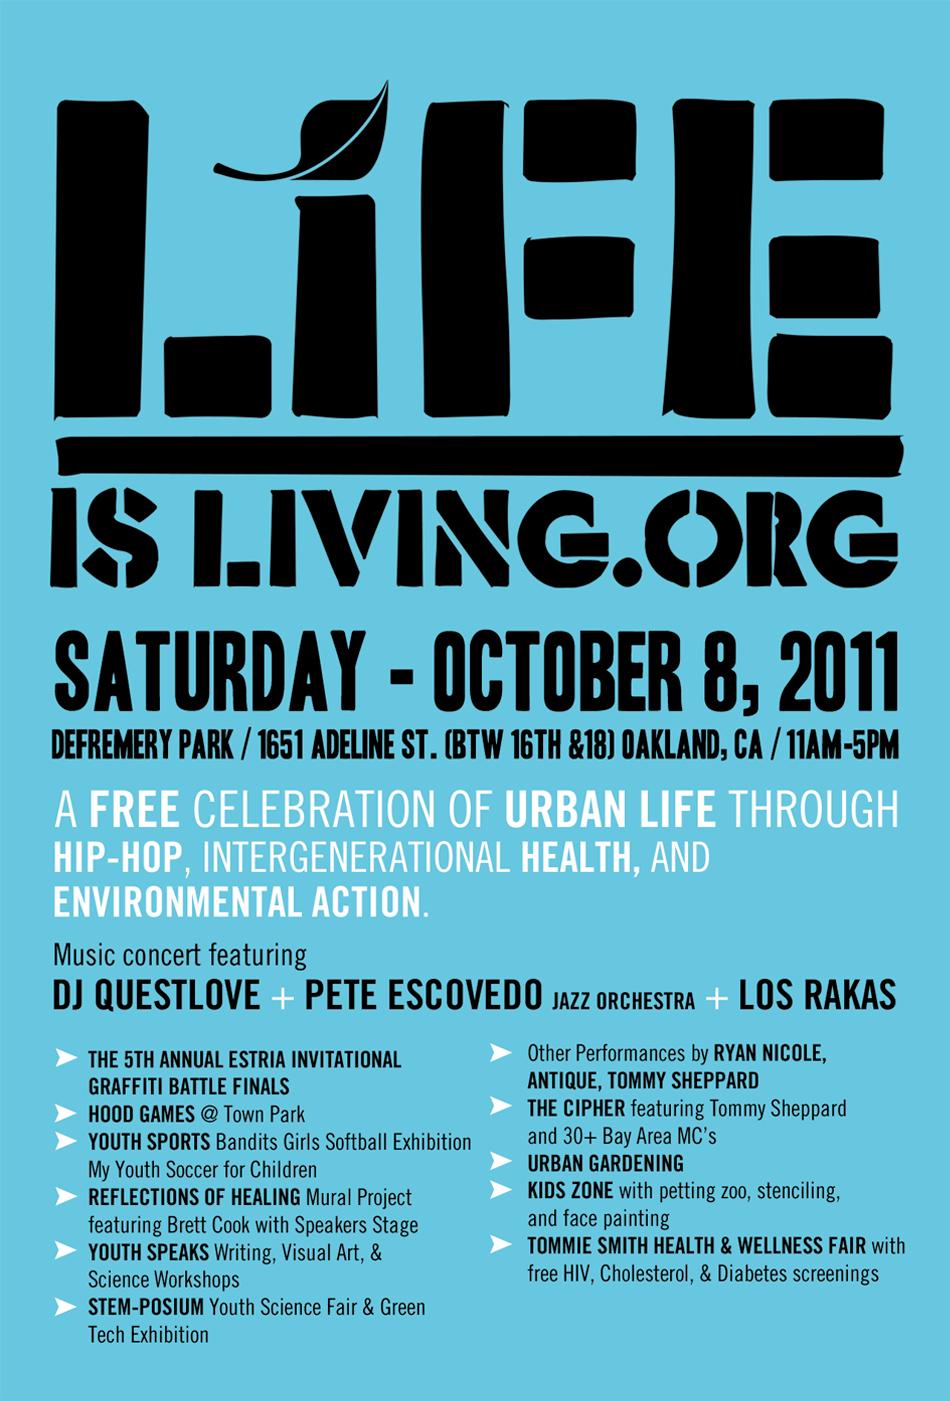 https://i1.wp.com/www.lifeisliving.org/ecoequity/wp-content/uploads/2011/09/LIL_Poster_2011.jpg